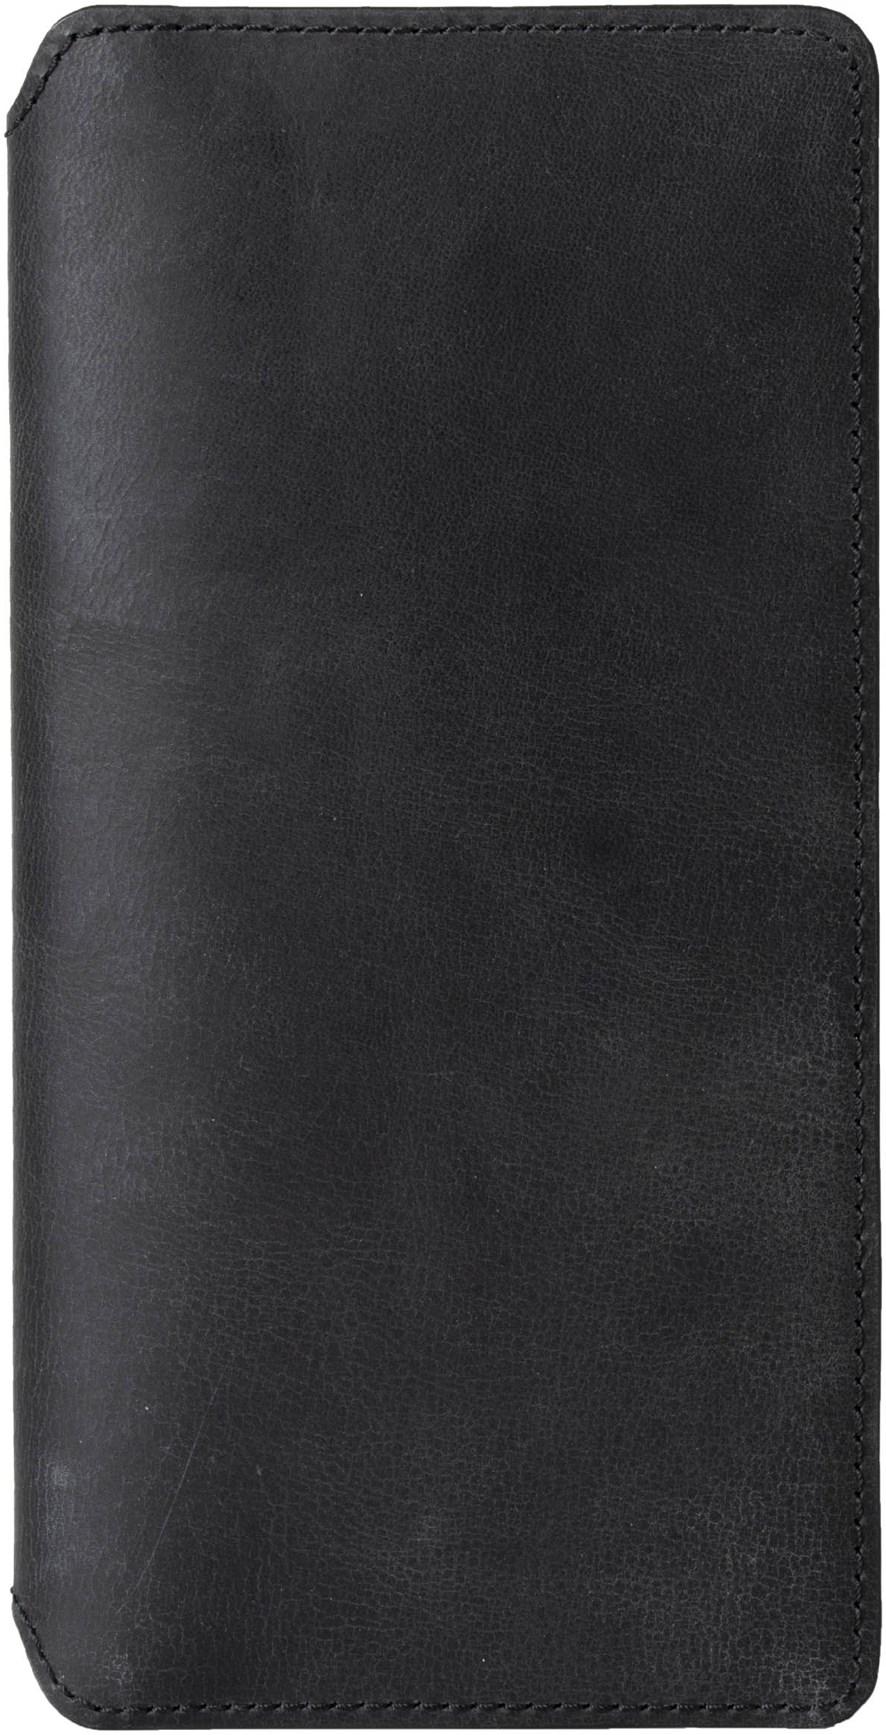 Krusell Sunne Phonewallet Samsung Galaxy Note 10 Plus Vintage Black